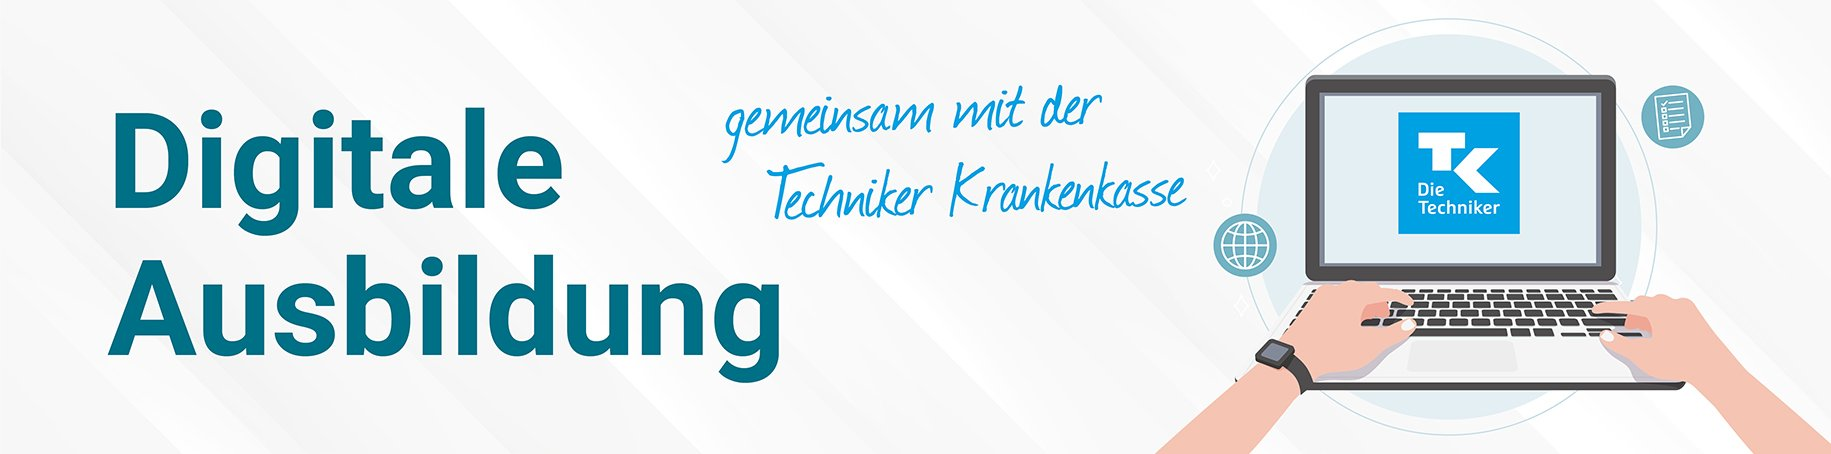 TK-Webinar - Digitale Ausbildung